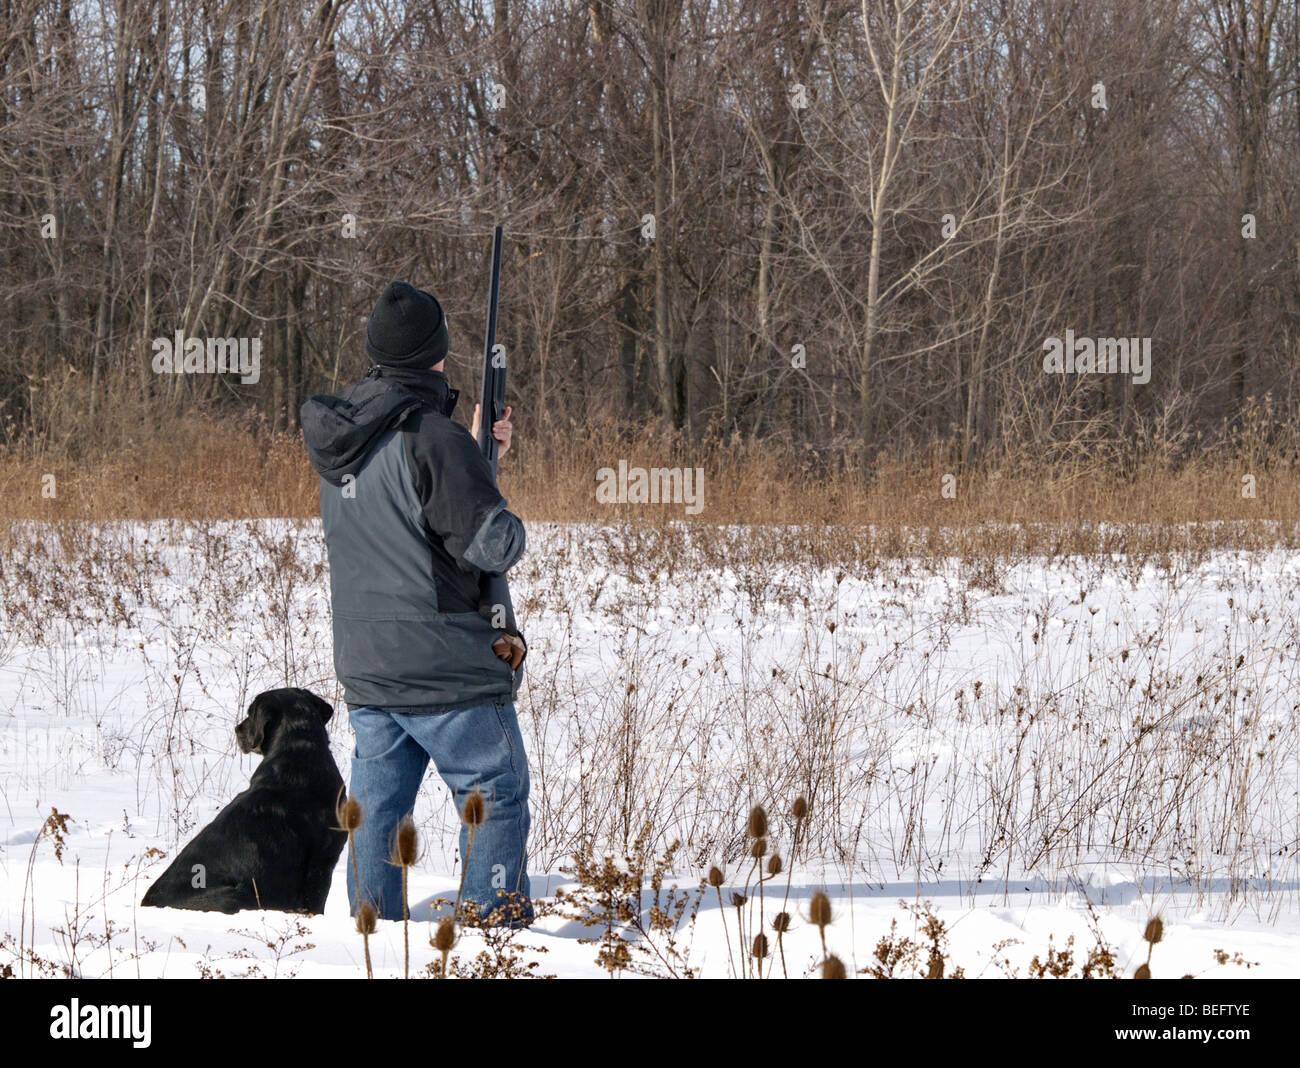 Ptarmigan Hunting Alaska